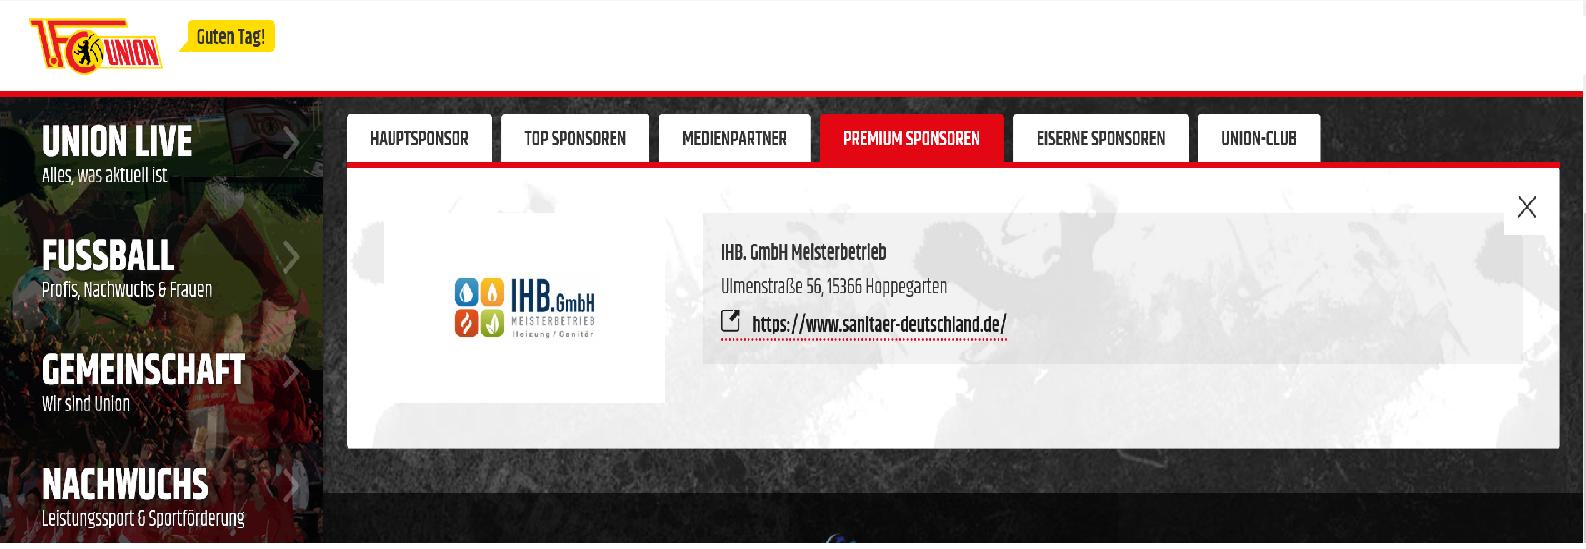 Premium Sponsoren - 1. FC Eisern Union